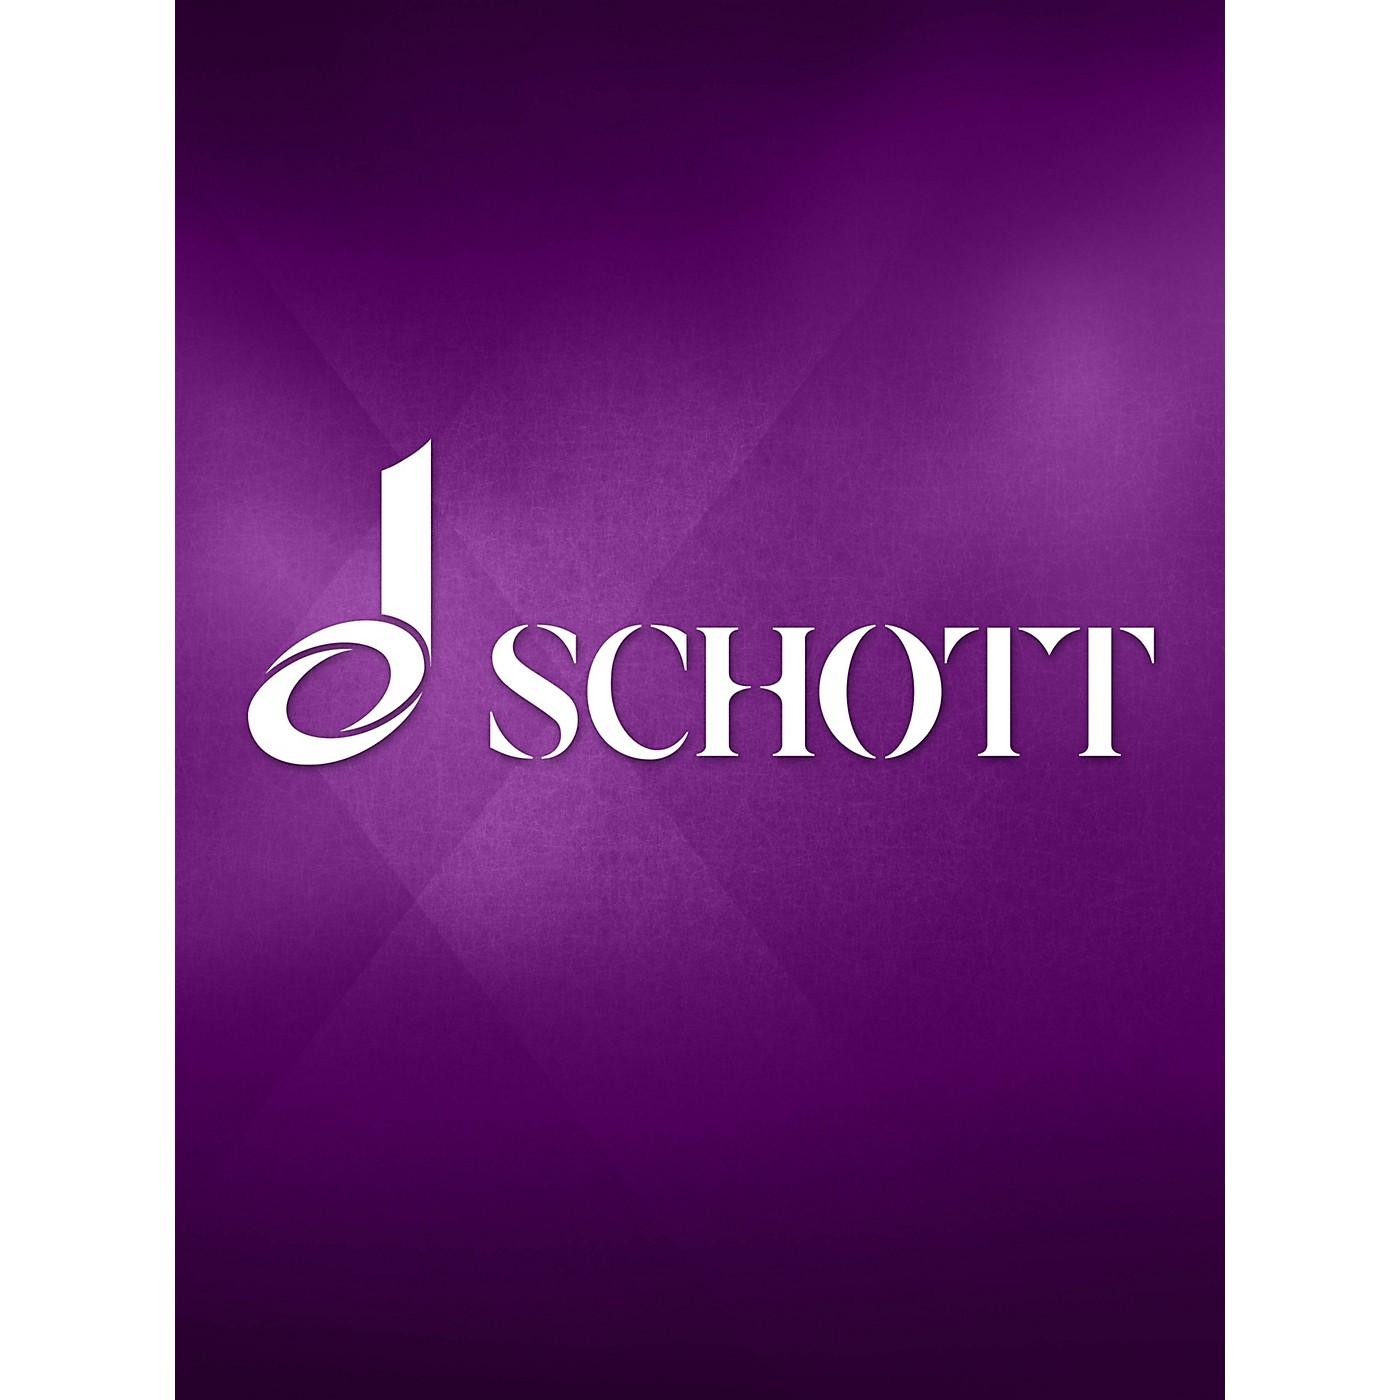 Eulenburg Concerto Grosso in C Major Op. 47, No. 2 RV 533 (Solo Flute II Part) Schott Series by Antonio Vivaldi thumbnail